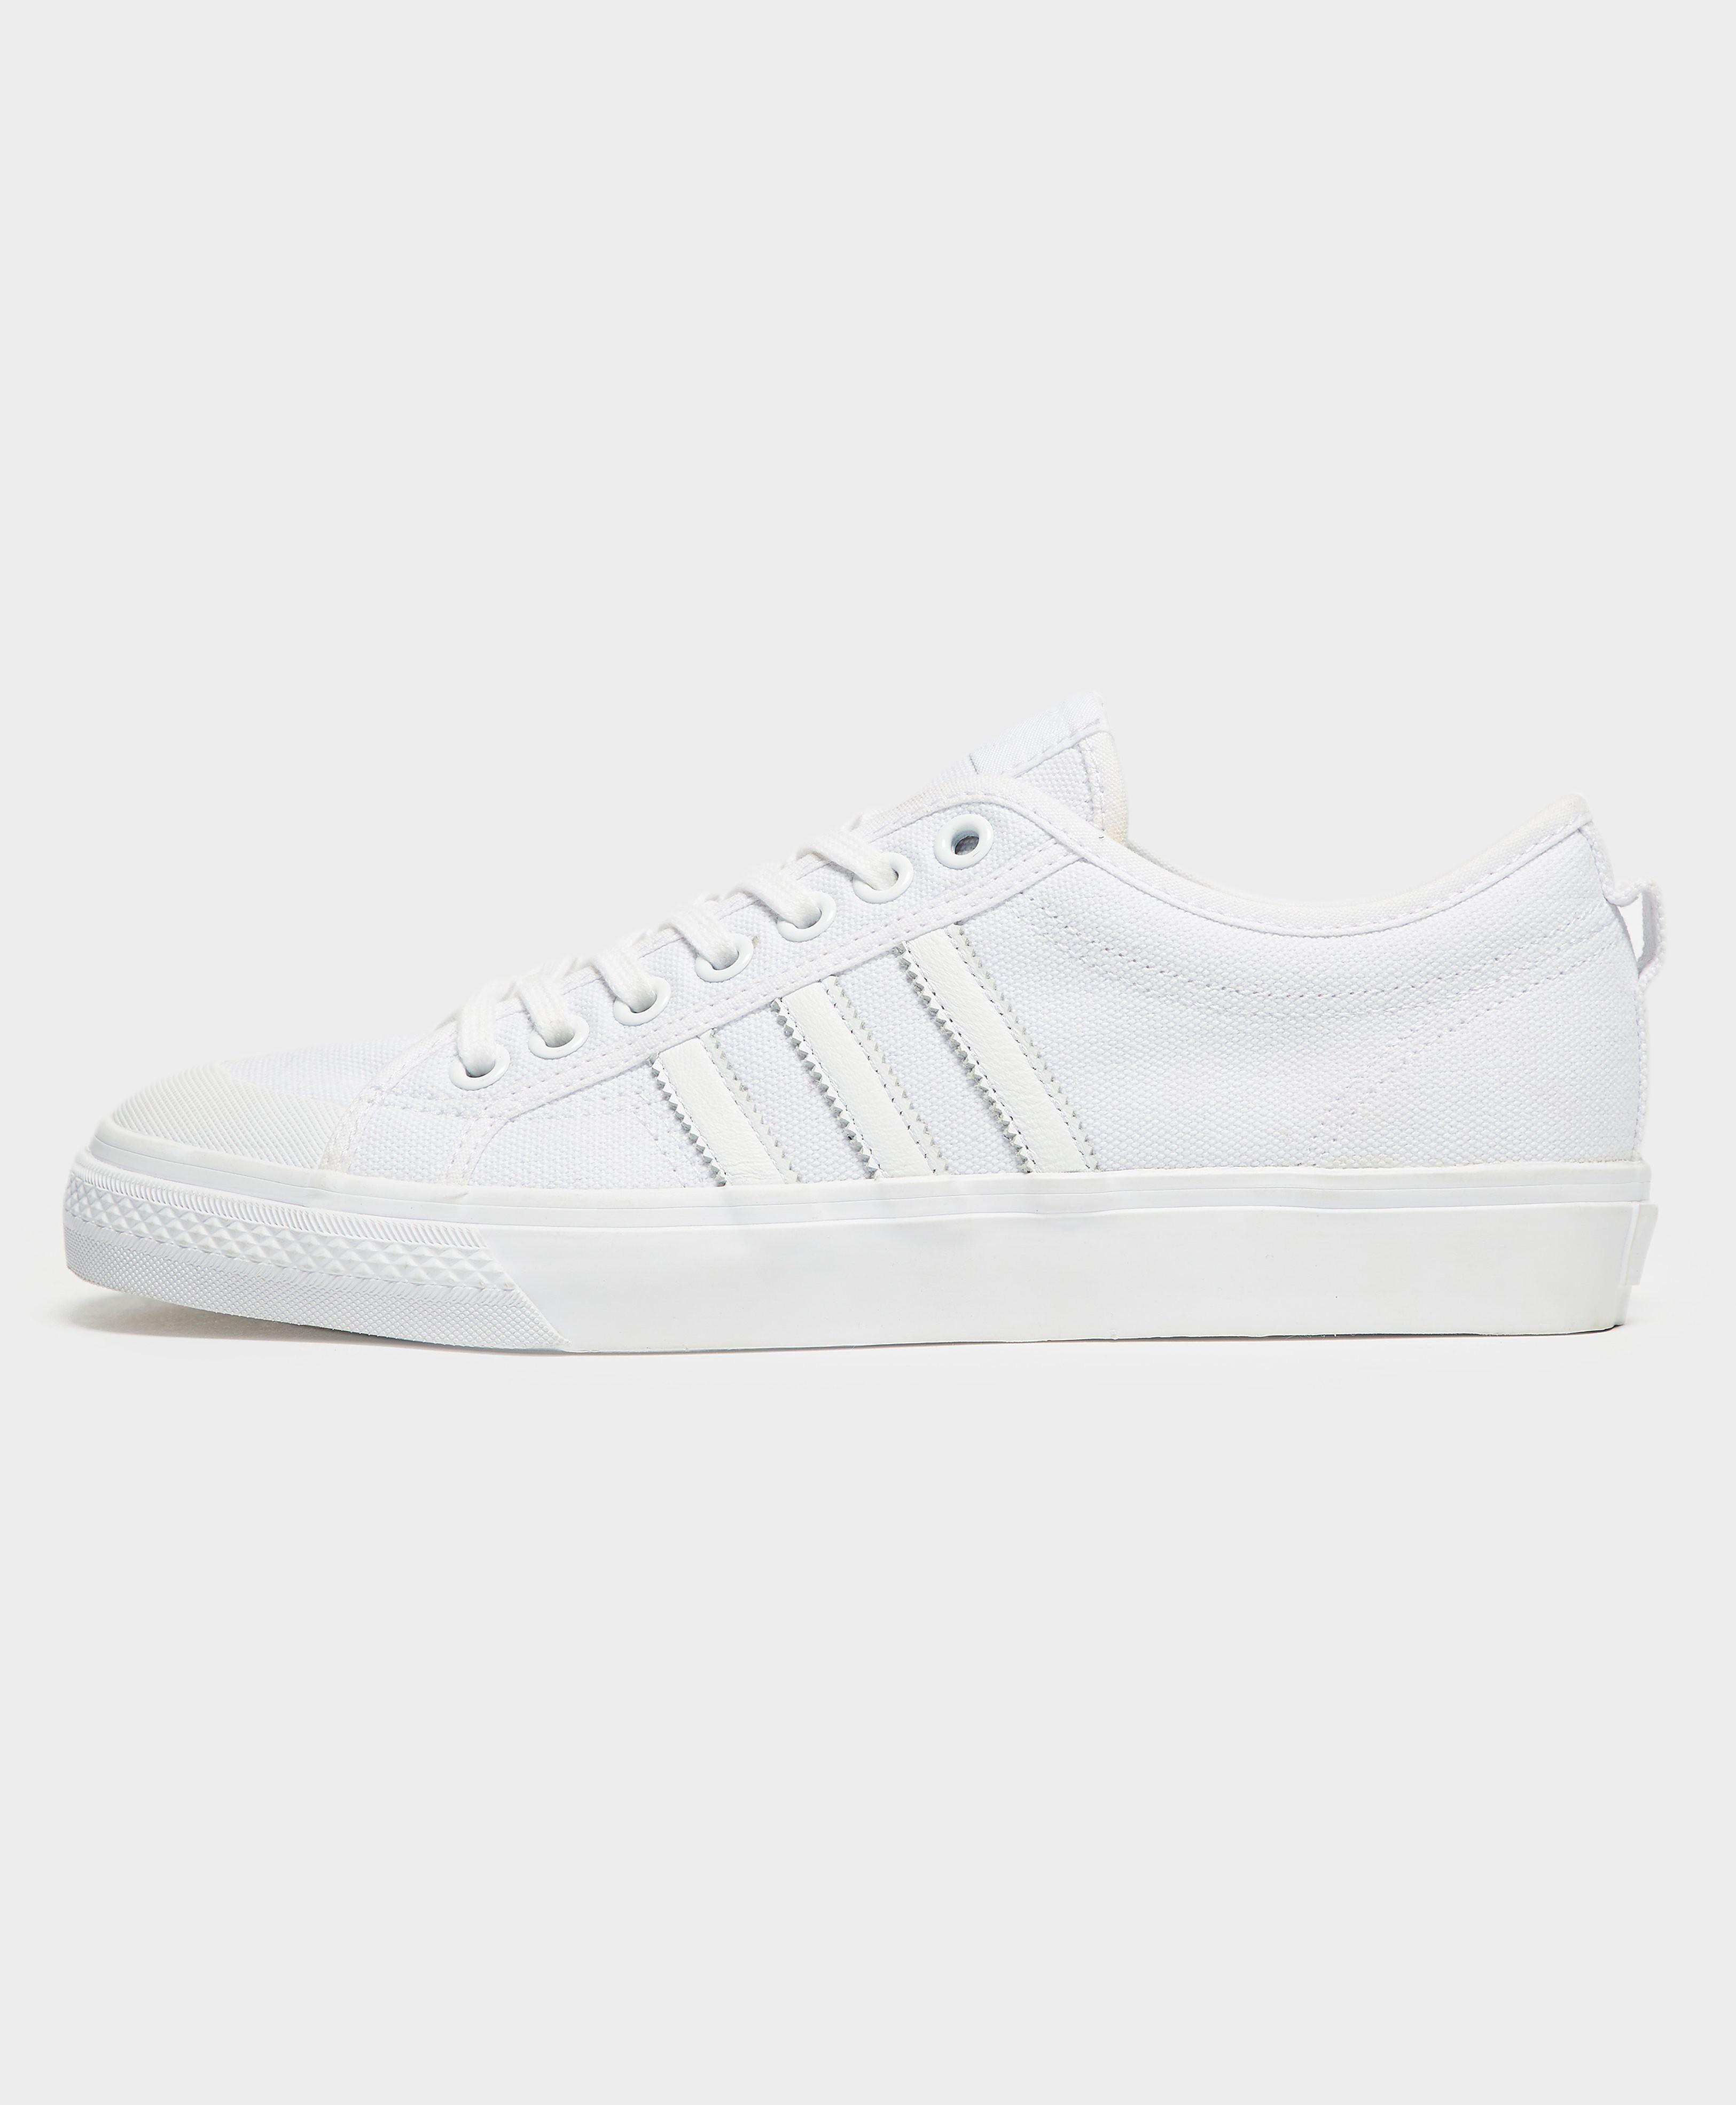 adidas Originals Nizza Lo - White a7d40f13c